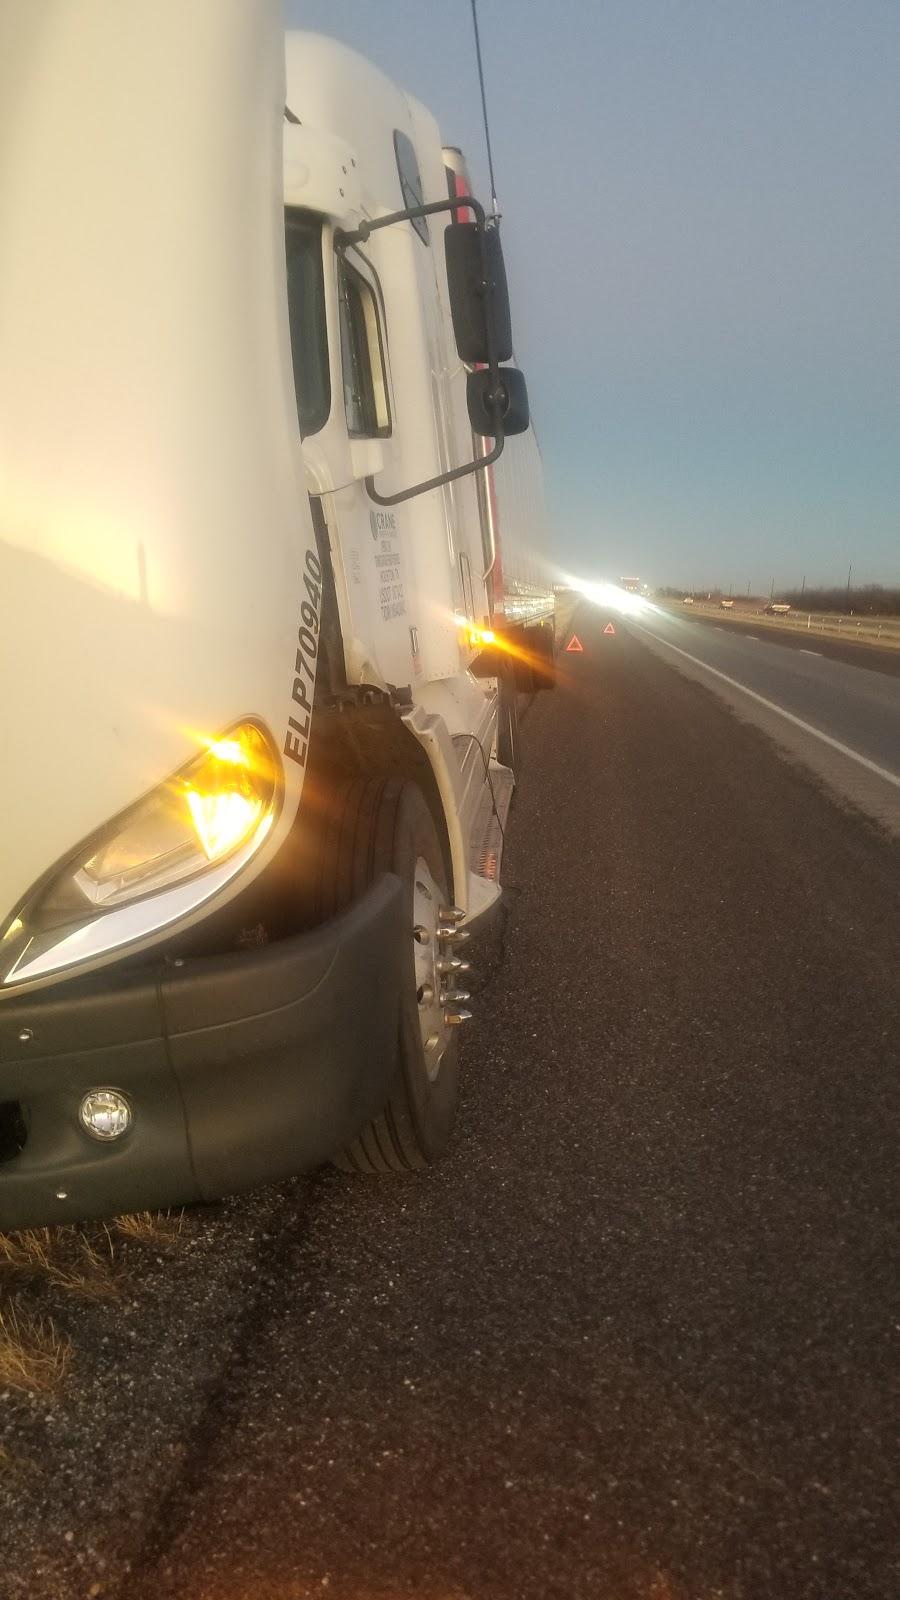 V&M SERVICE TRUCK - car repair  | Photo 4 of 7 | Address: 700 Peyton Rd, El Paso, TX 79928, USA | Phone: (915) 764-8502